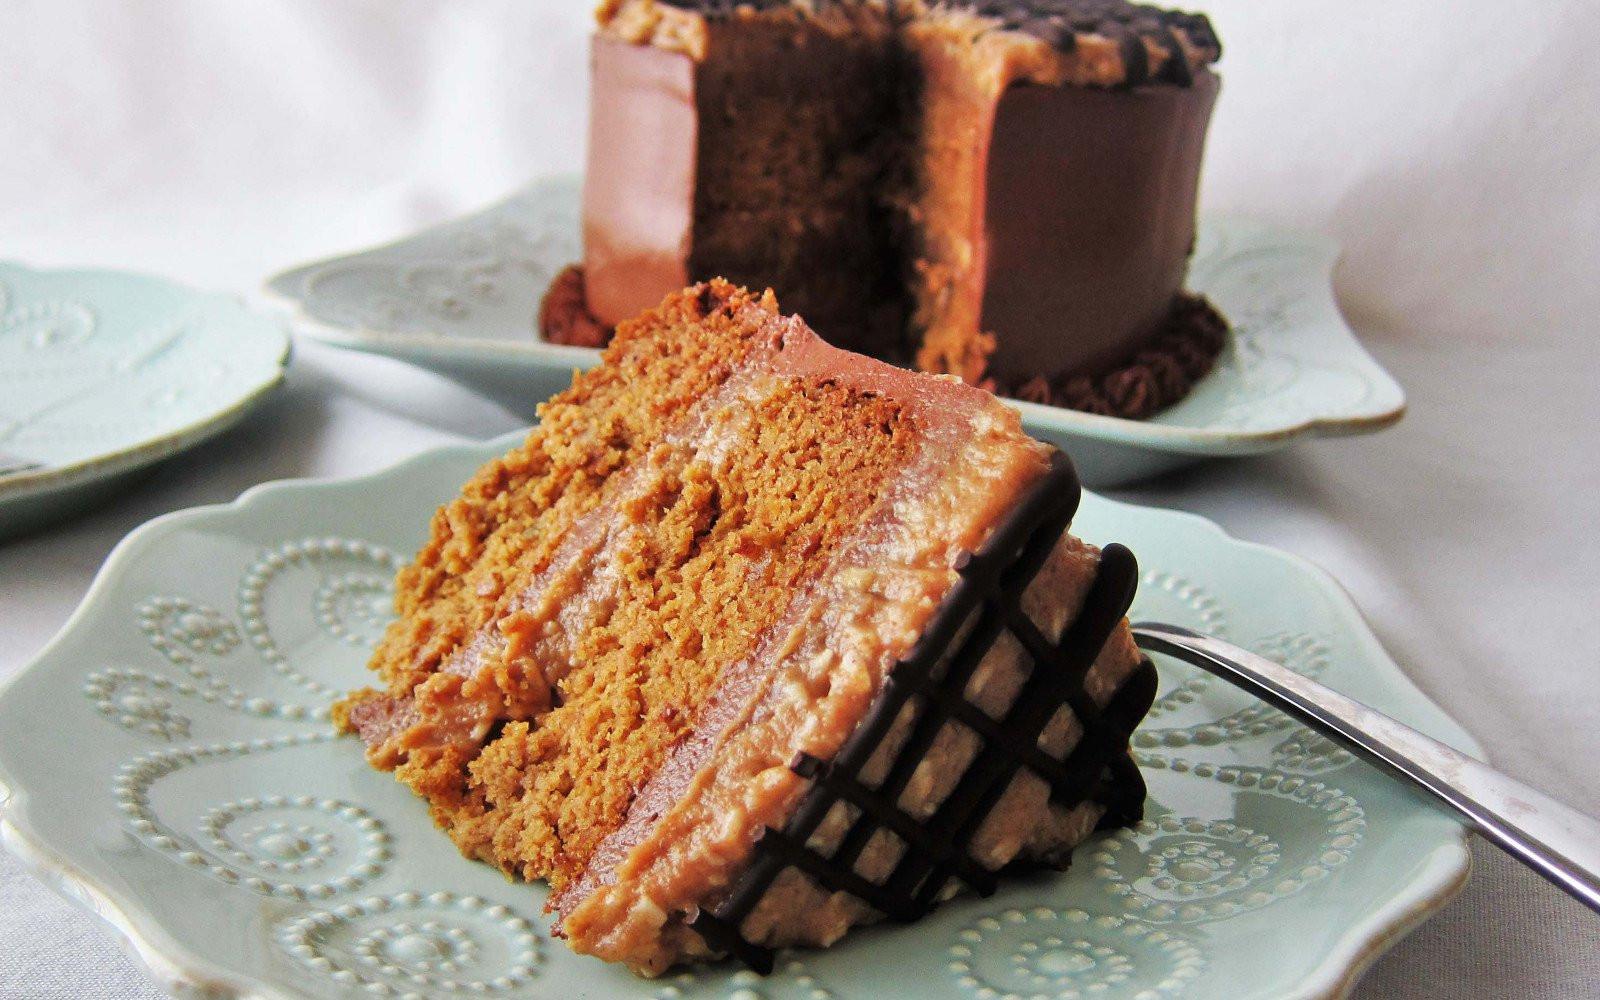 Best ideas about Vegan Birthday Cake Recipe . Save or Pin 15 Decadent Vegan Birthday Cake Recipes e Green Now.